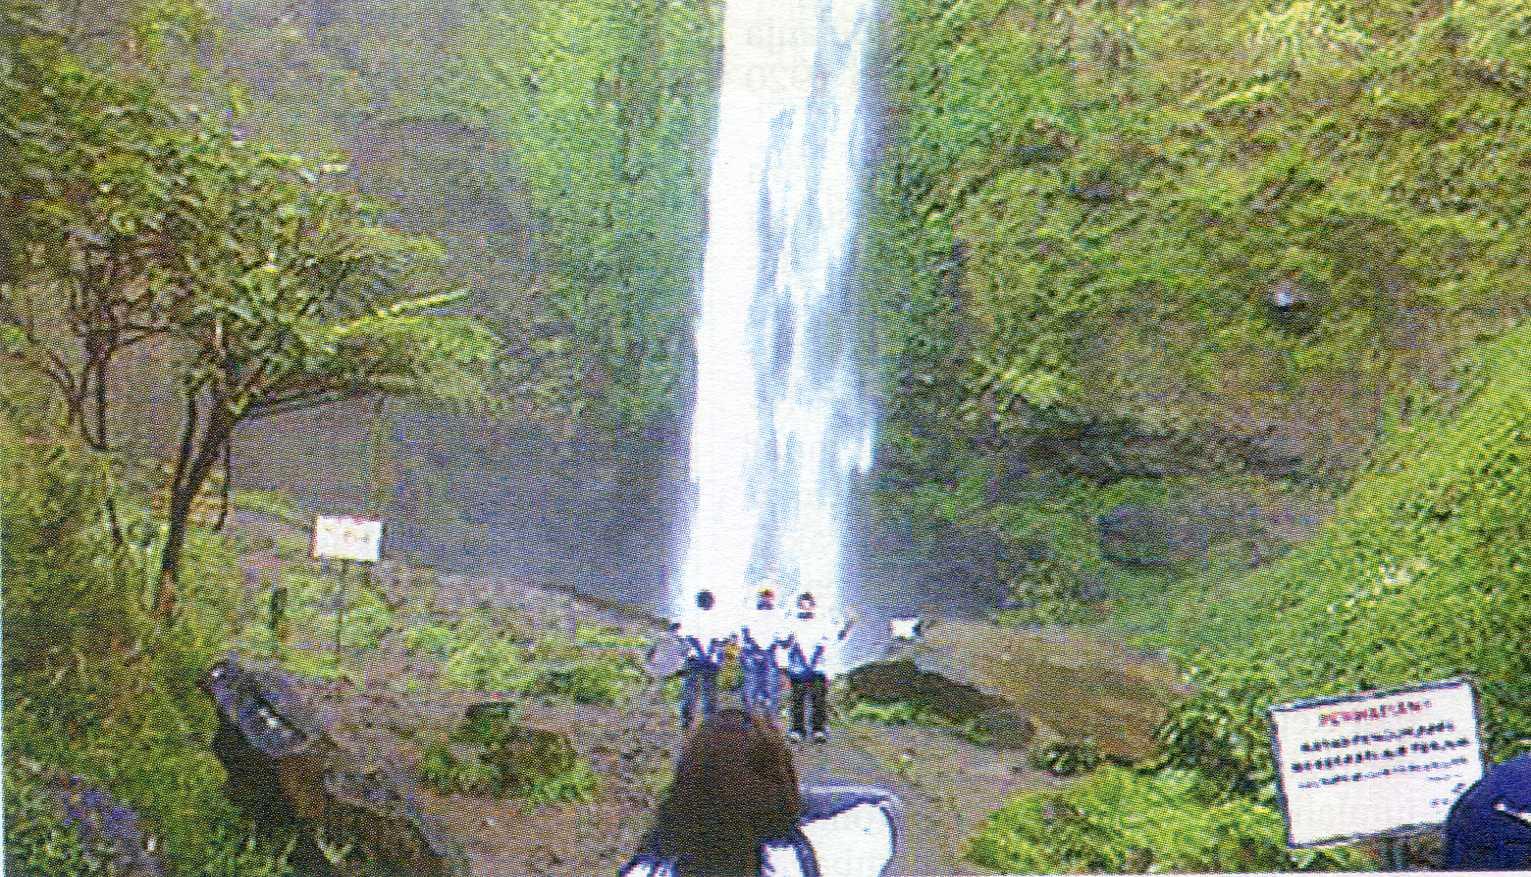 Tlekung Kota Batu Wisata Jawatimuran Pariwisata Goa Jepang Kab Jombang